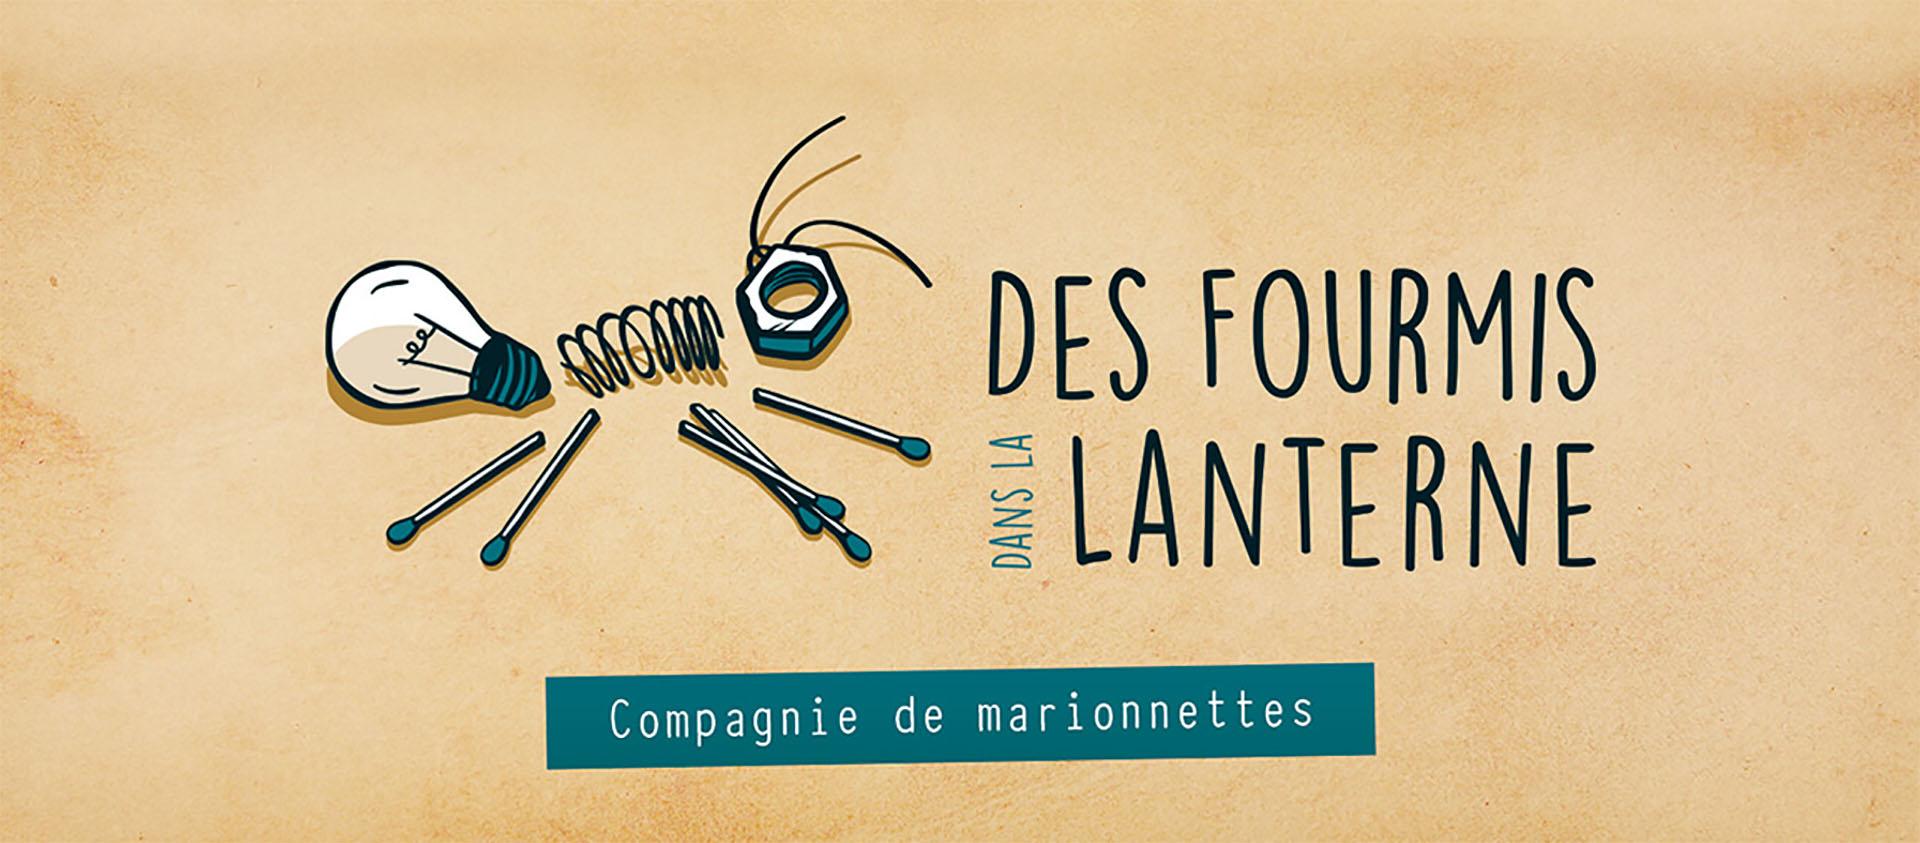 fourmis-dans-la-lanterne-img-home-logo